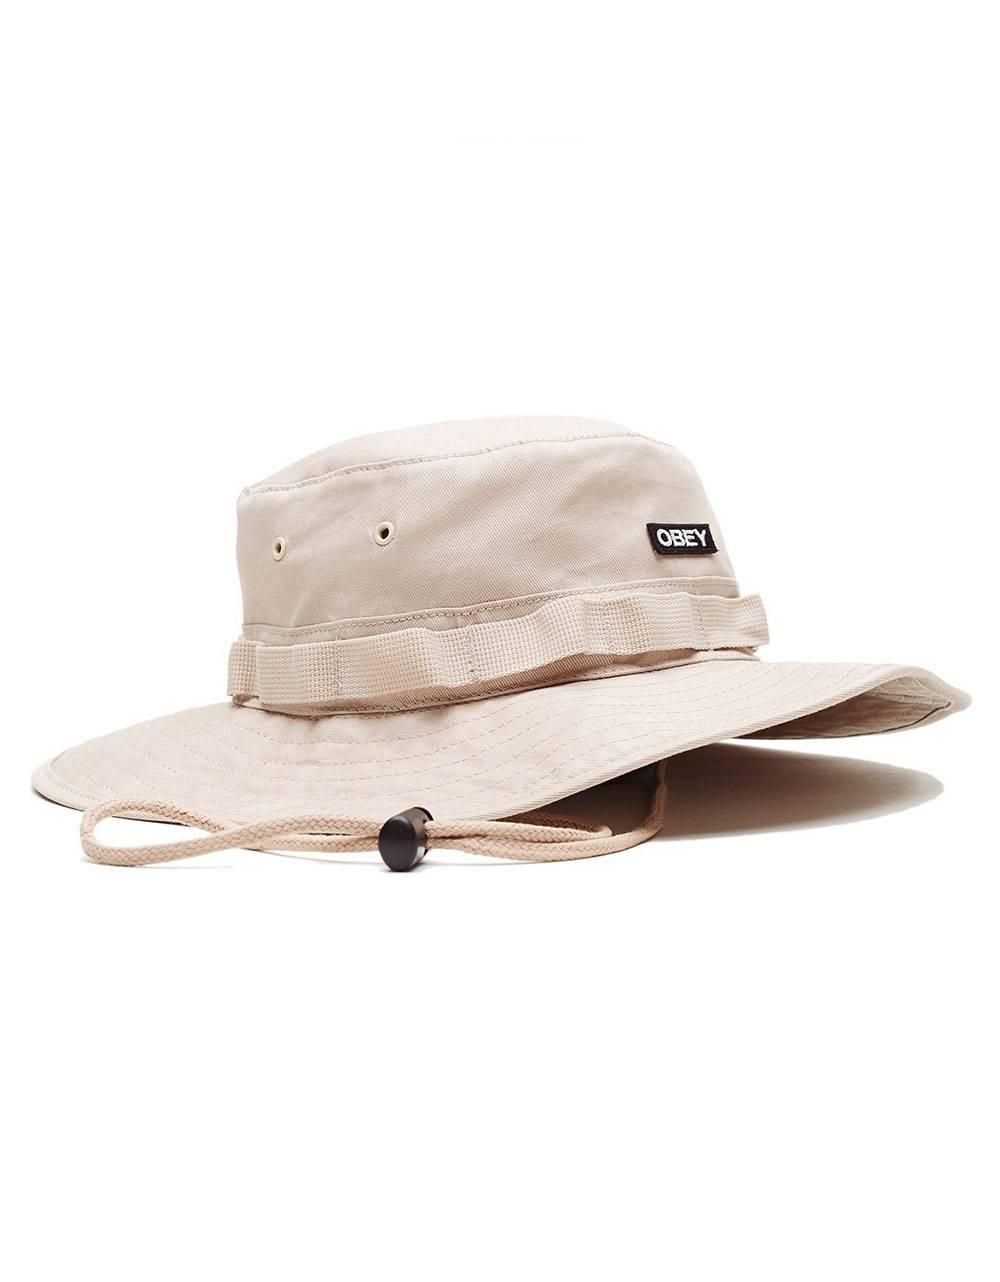 Obey river boonie hat - khaki obey Hat 50,00€